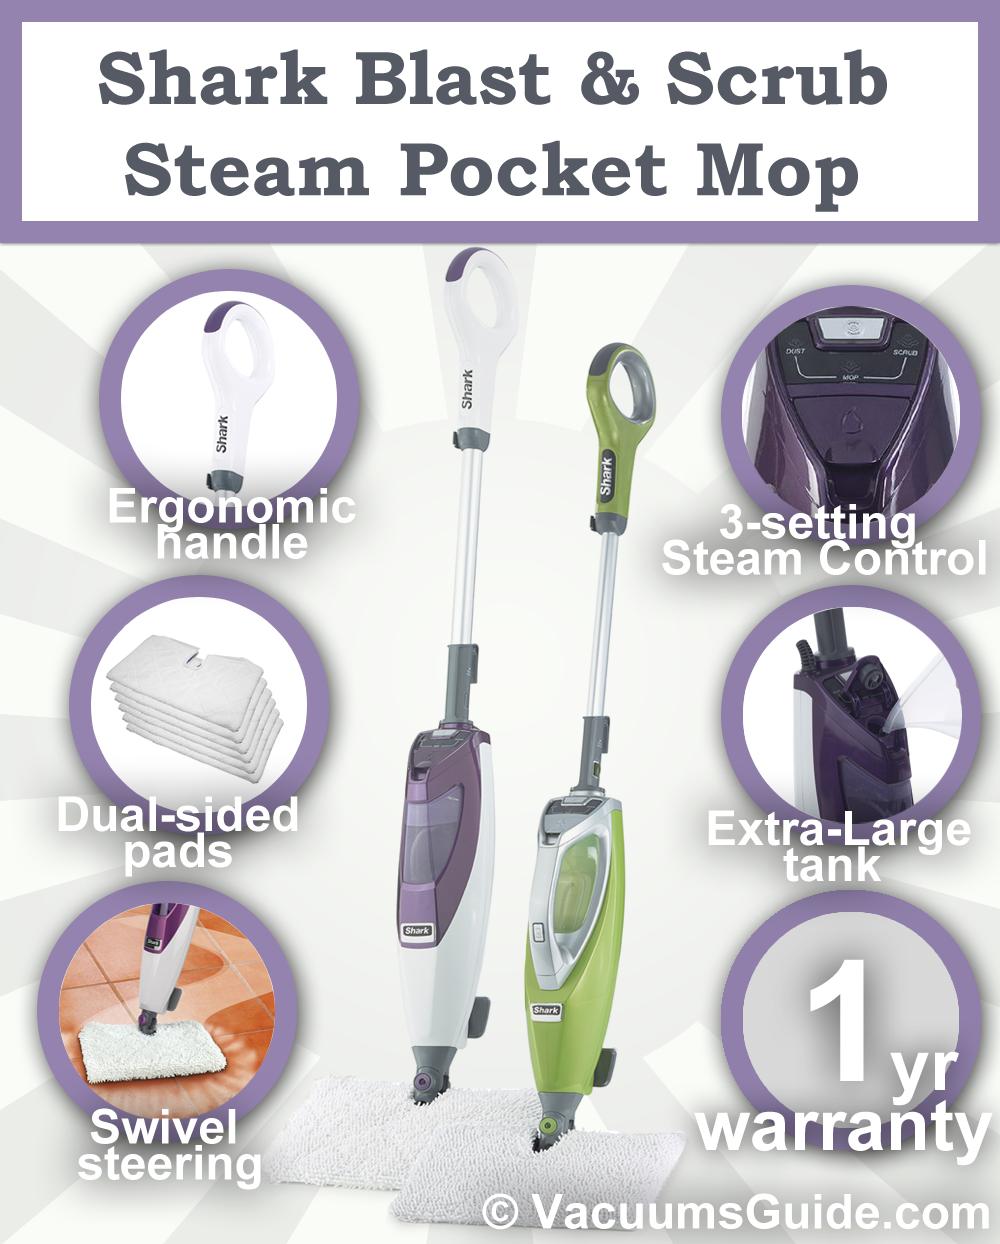 Shark Blast Amp Scrub Steam Pocket Mop Not Your Ordinary Steamer